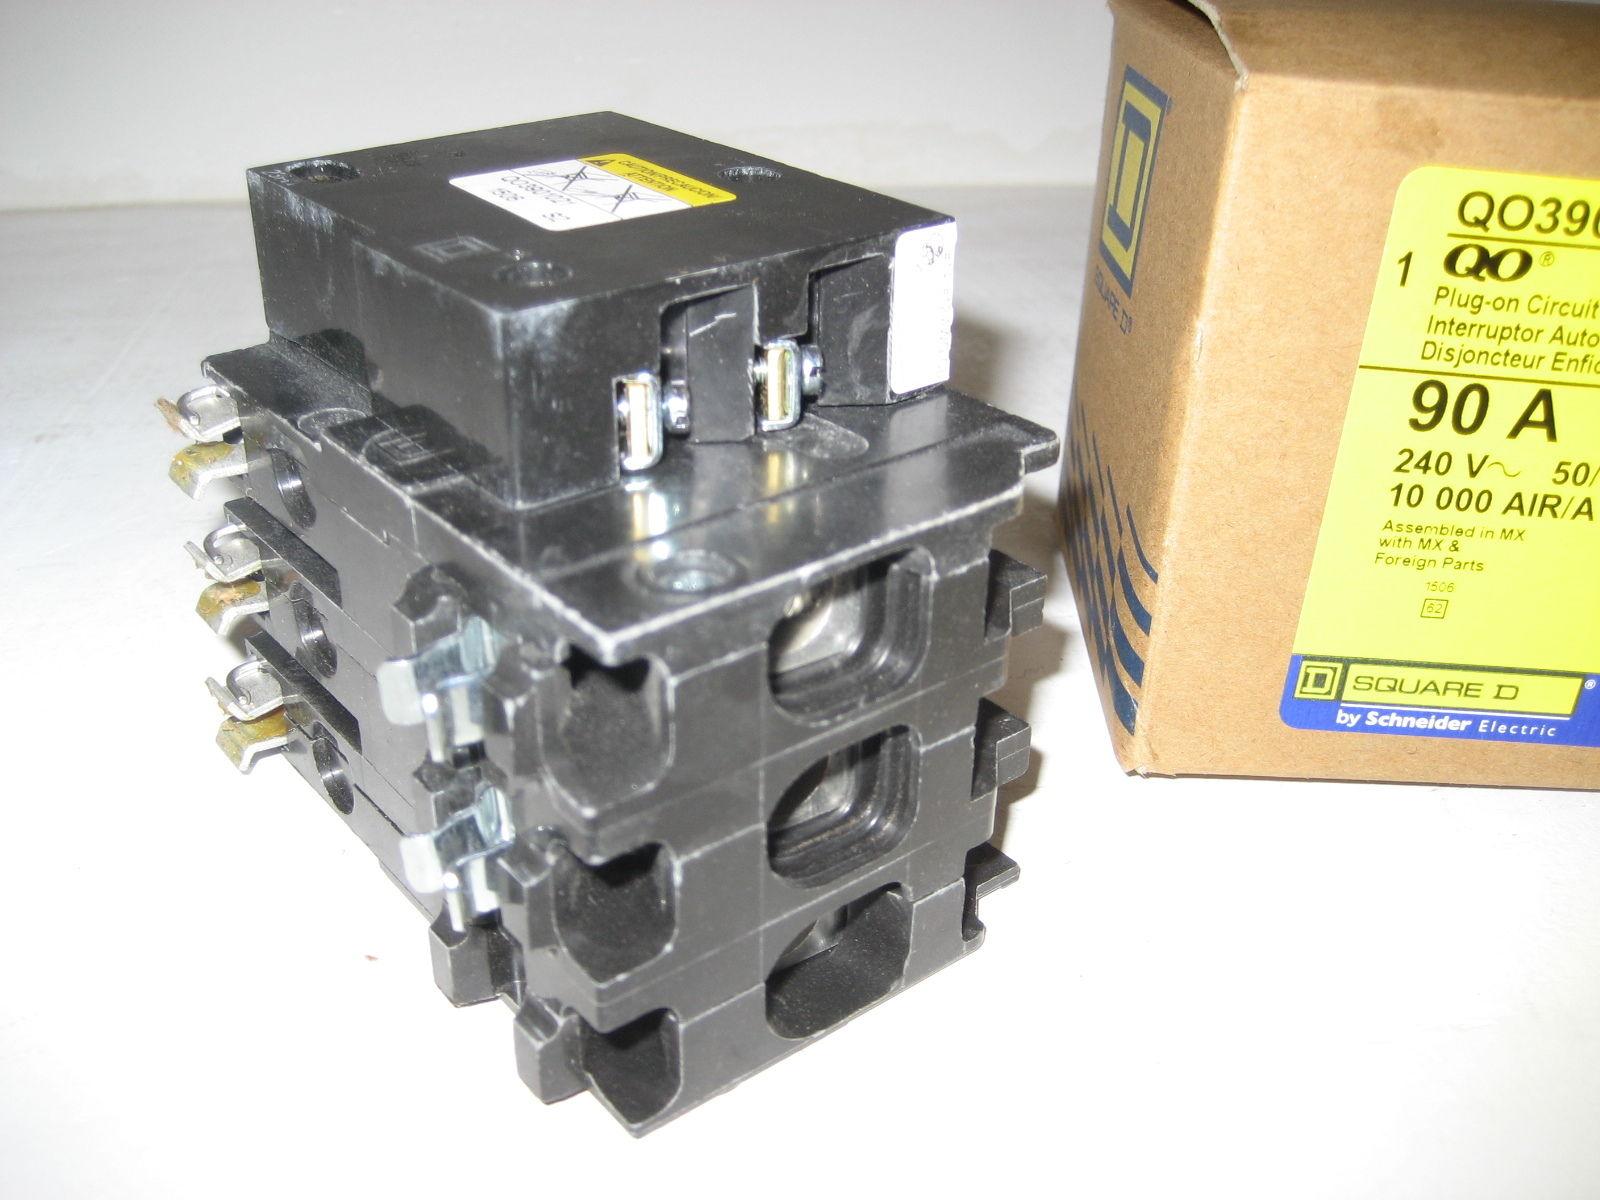 Wiring Square D Shunt Mx Complete Diagrams 3 Phase Breaker Panel Diagram New Qo3901021 Trip Pole 90 Amp Qo Rh Poweredelectricsupply Com Manual